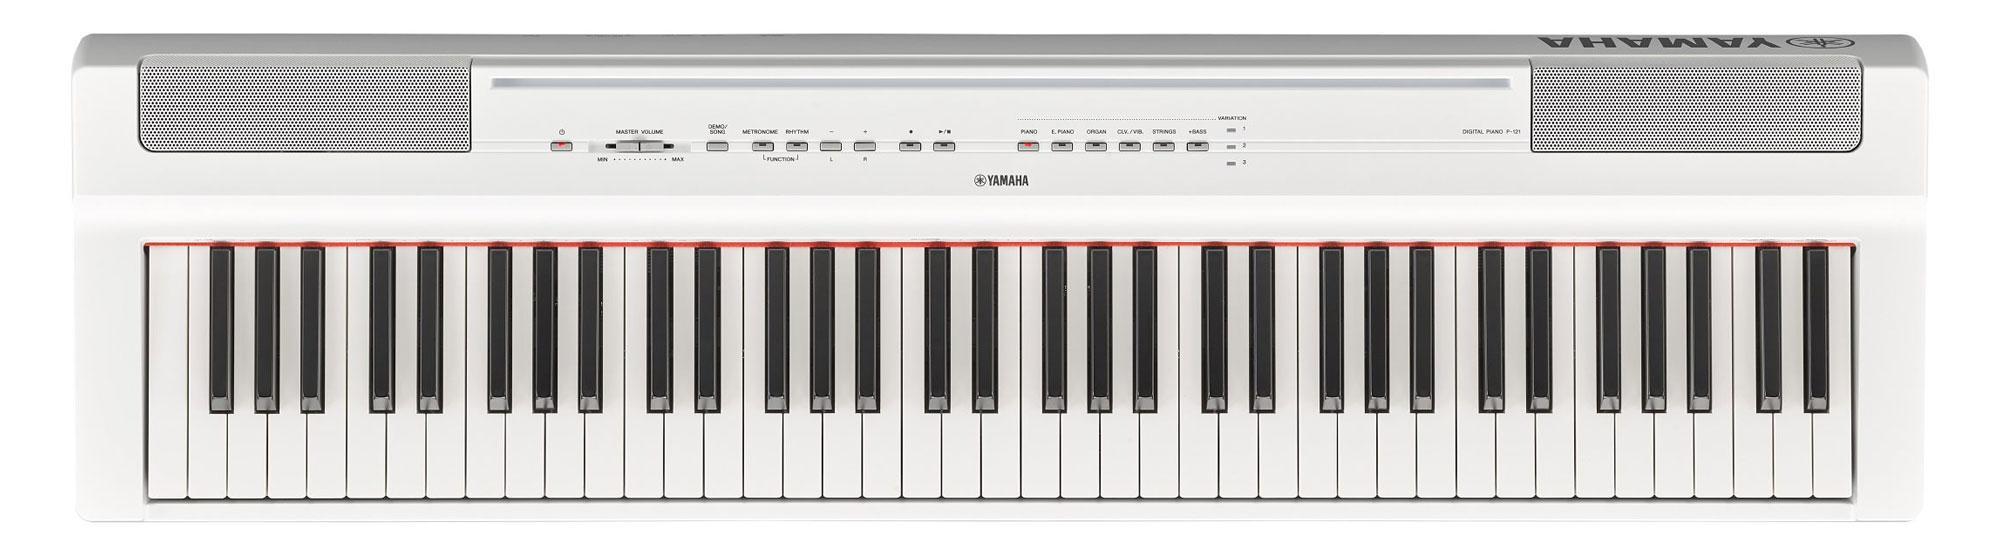 Stagepianos - Yamaha P 121WH Stage Piano Weiß - Onlineshop Musikhaus Kirstein